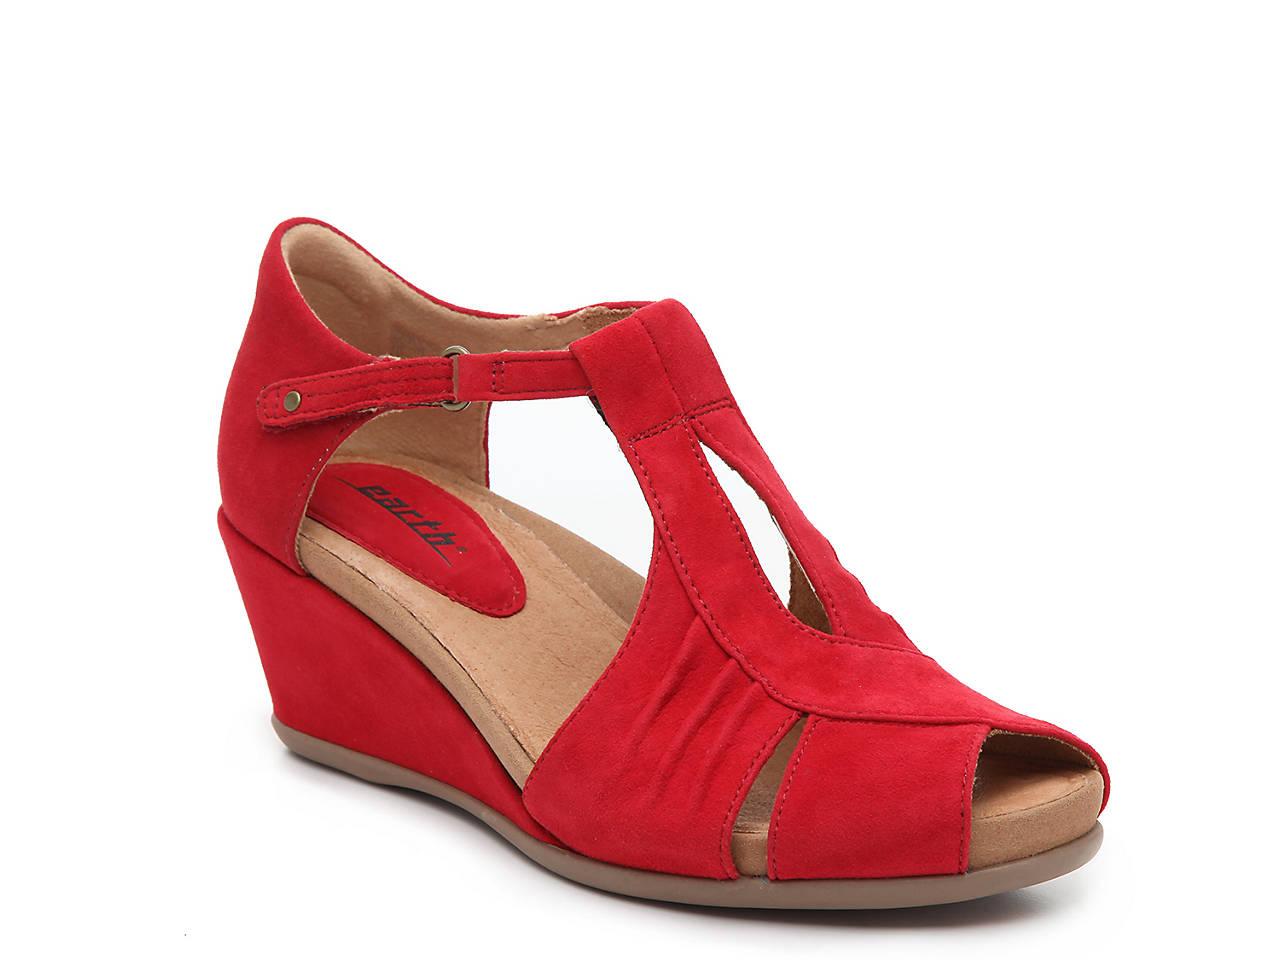 bccc08ff7d7f Earth Primrose Wedge Sandal Women s Shoes